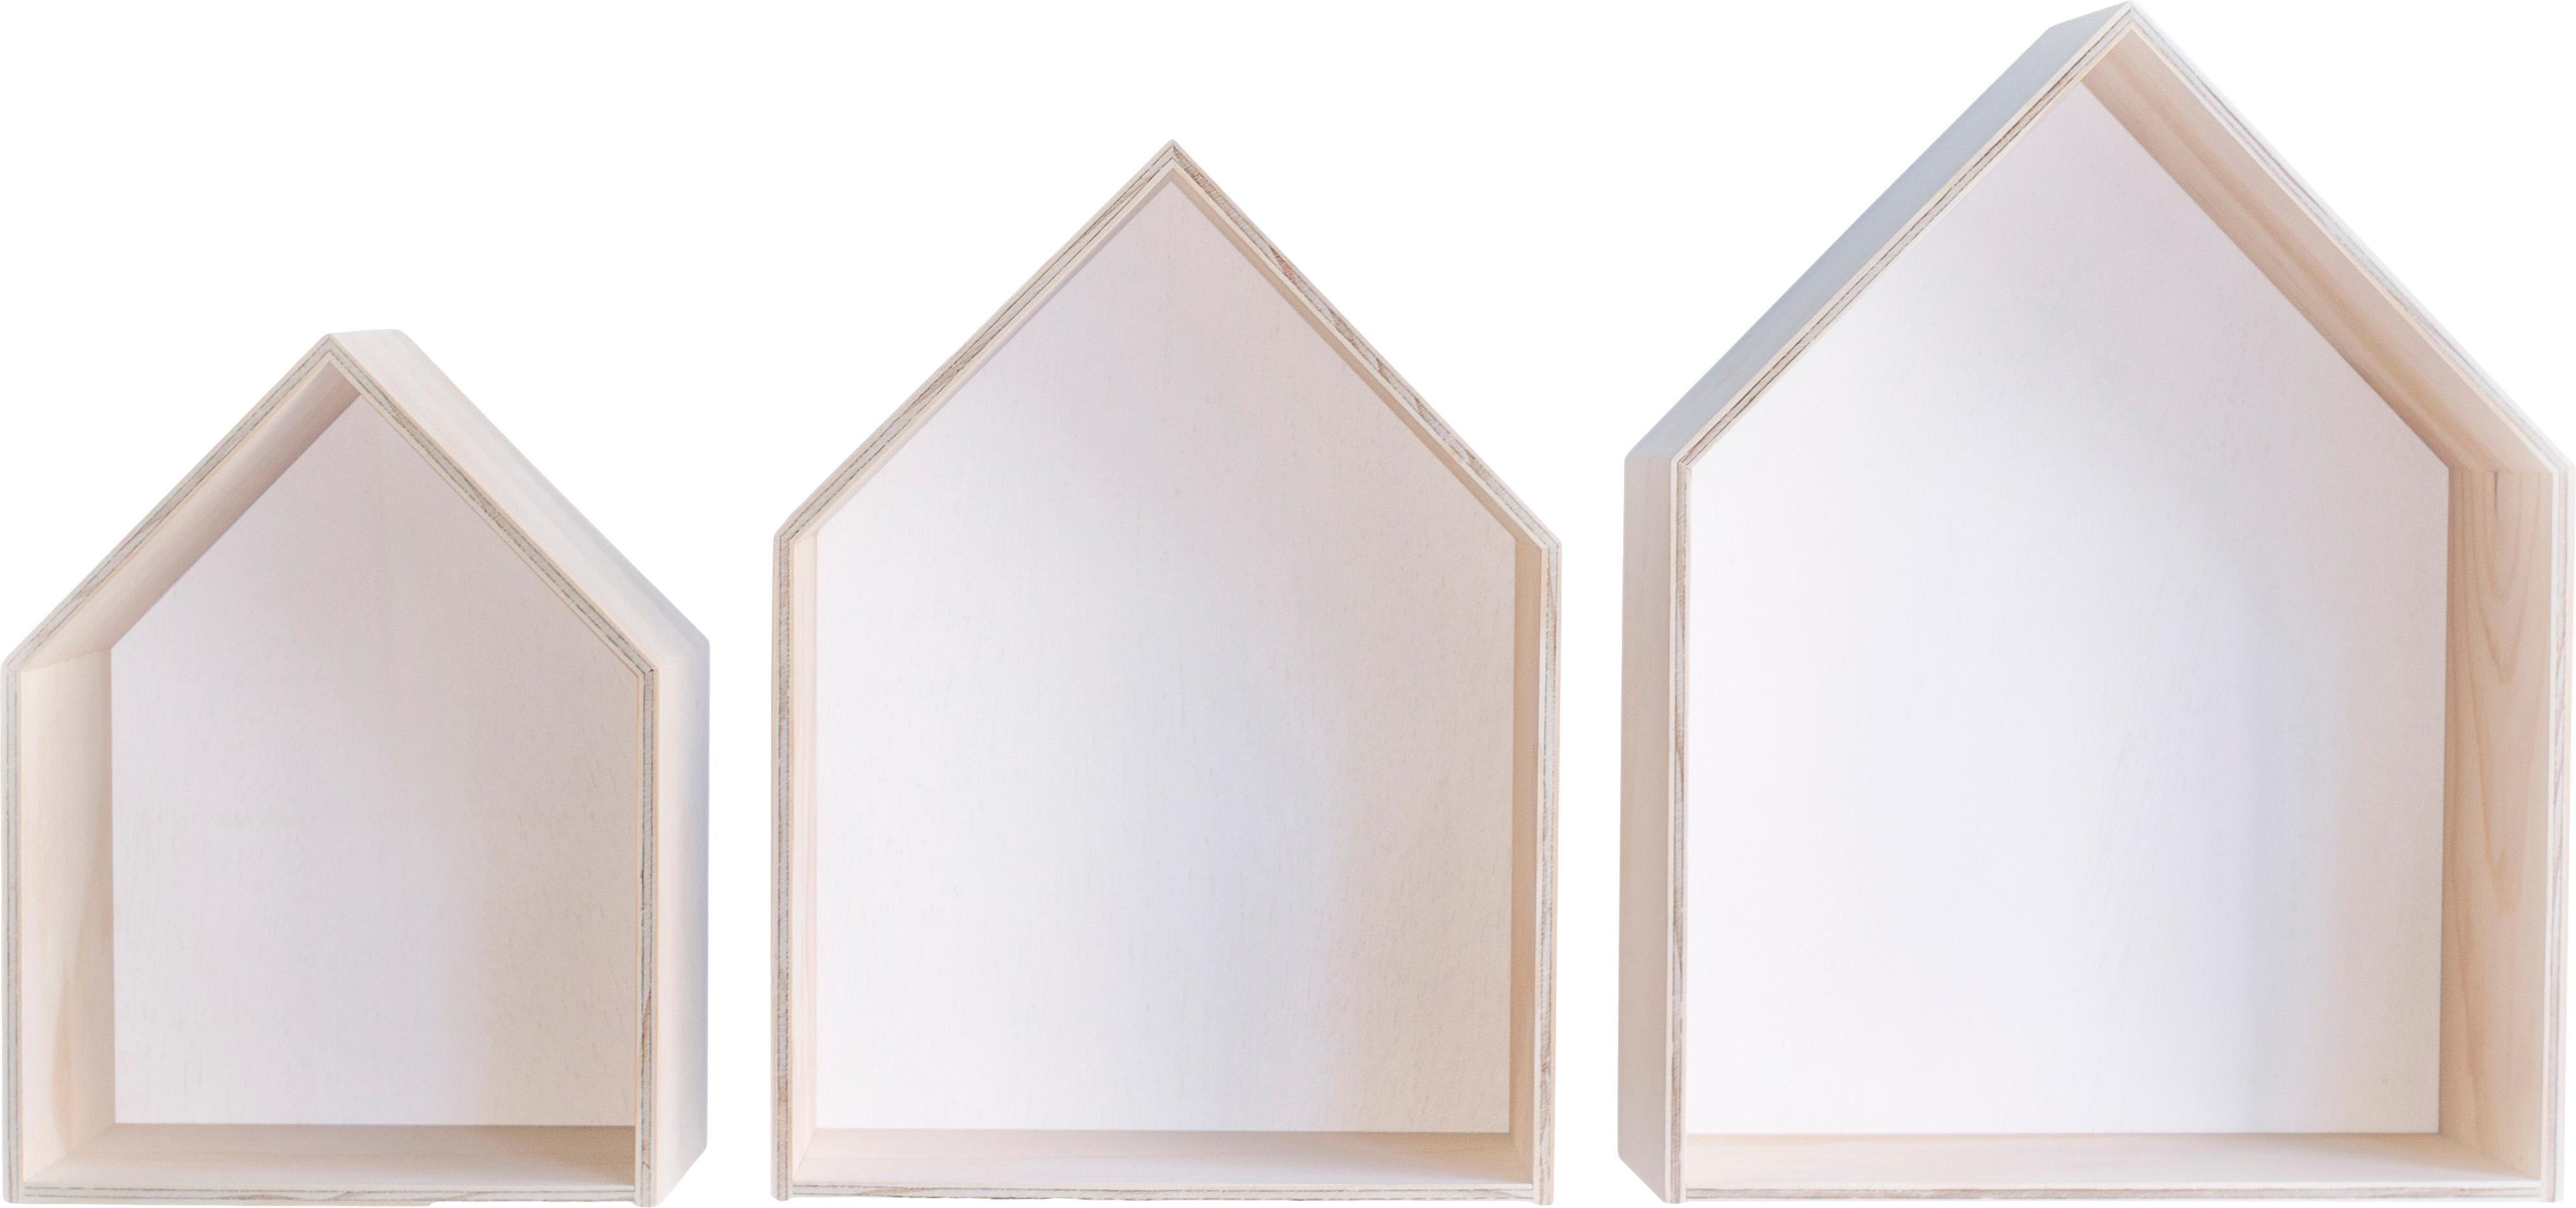 Wandrekkenset Blanca, 3-delig, Multiplex, Lichtbruin, wit, Verschillende formaten